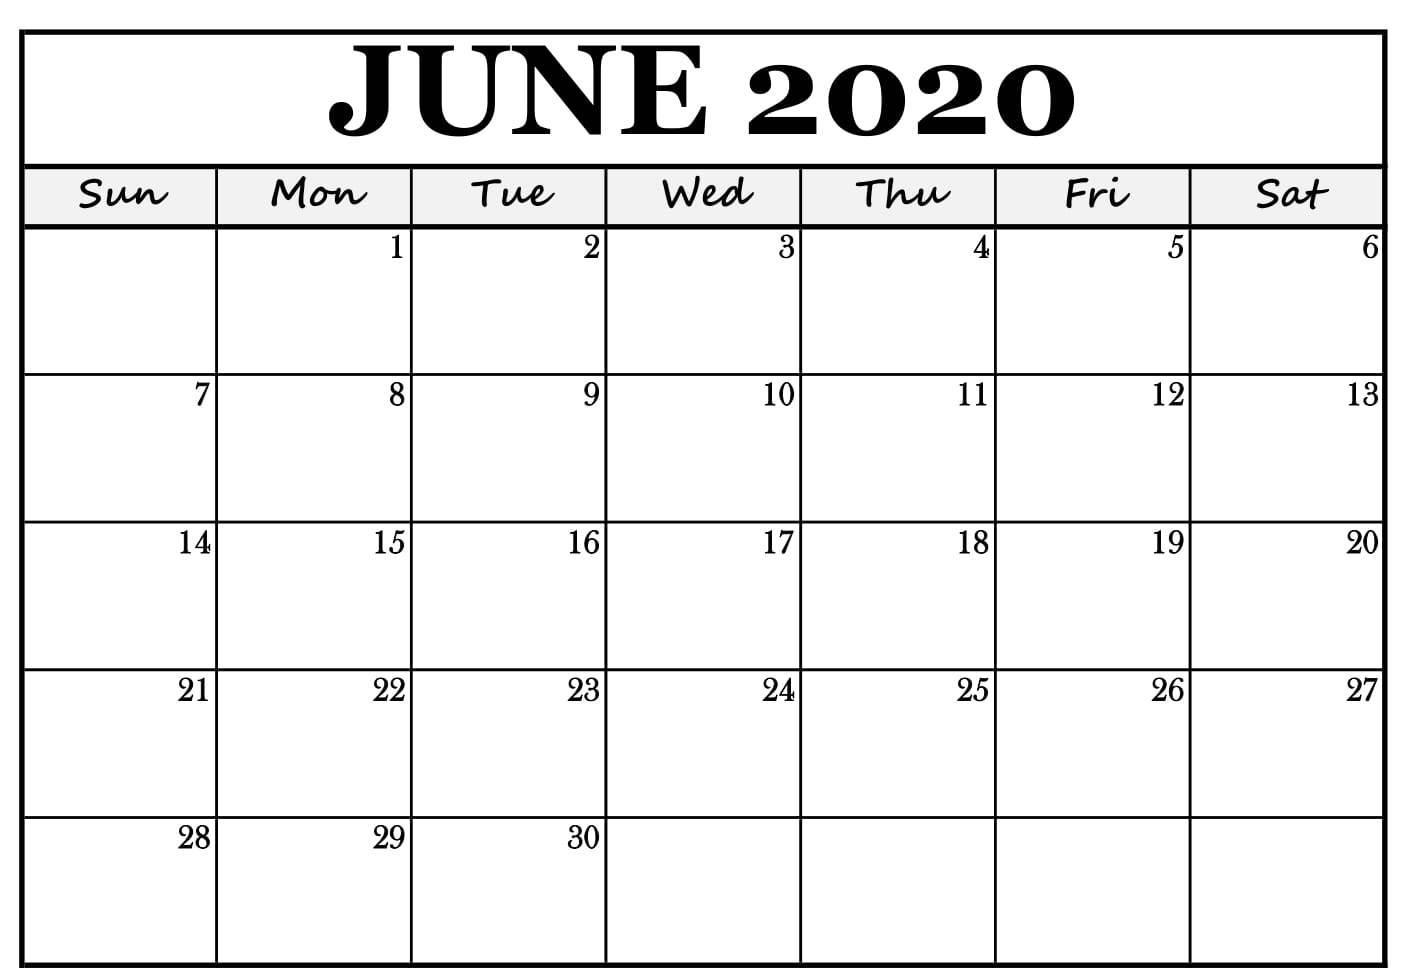 2020 June Calendar Template